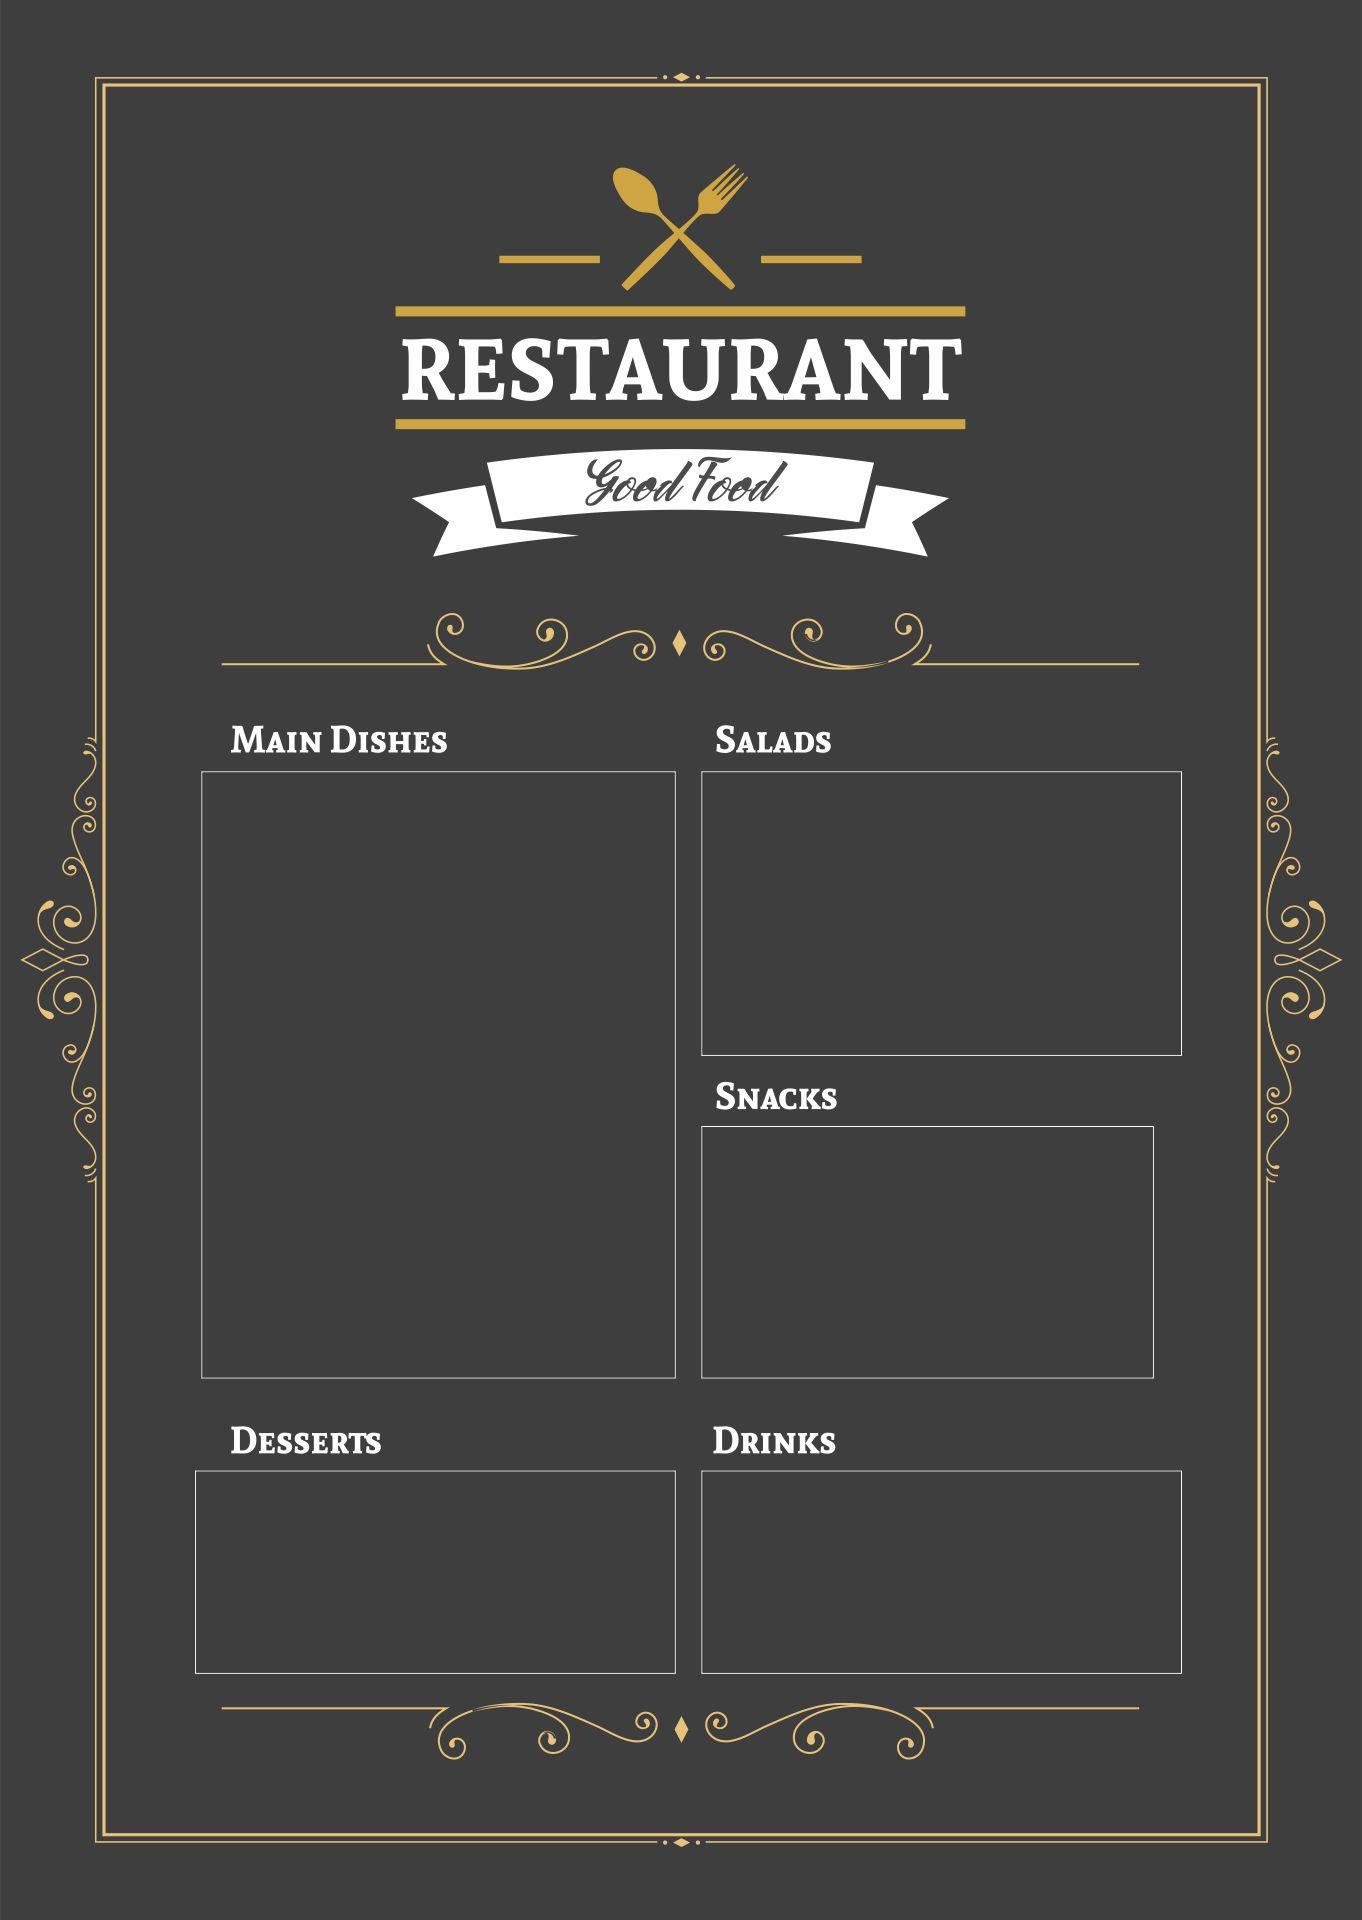 Blank Restaurant Menu Template Free Download